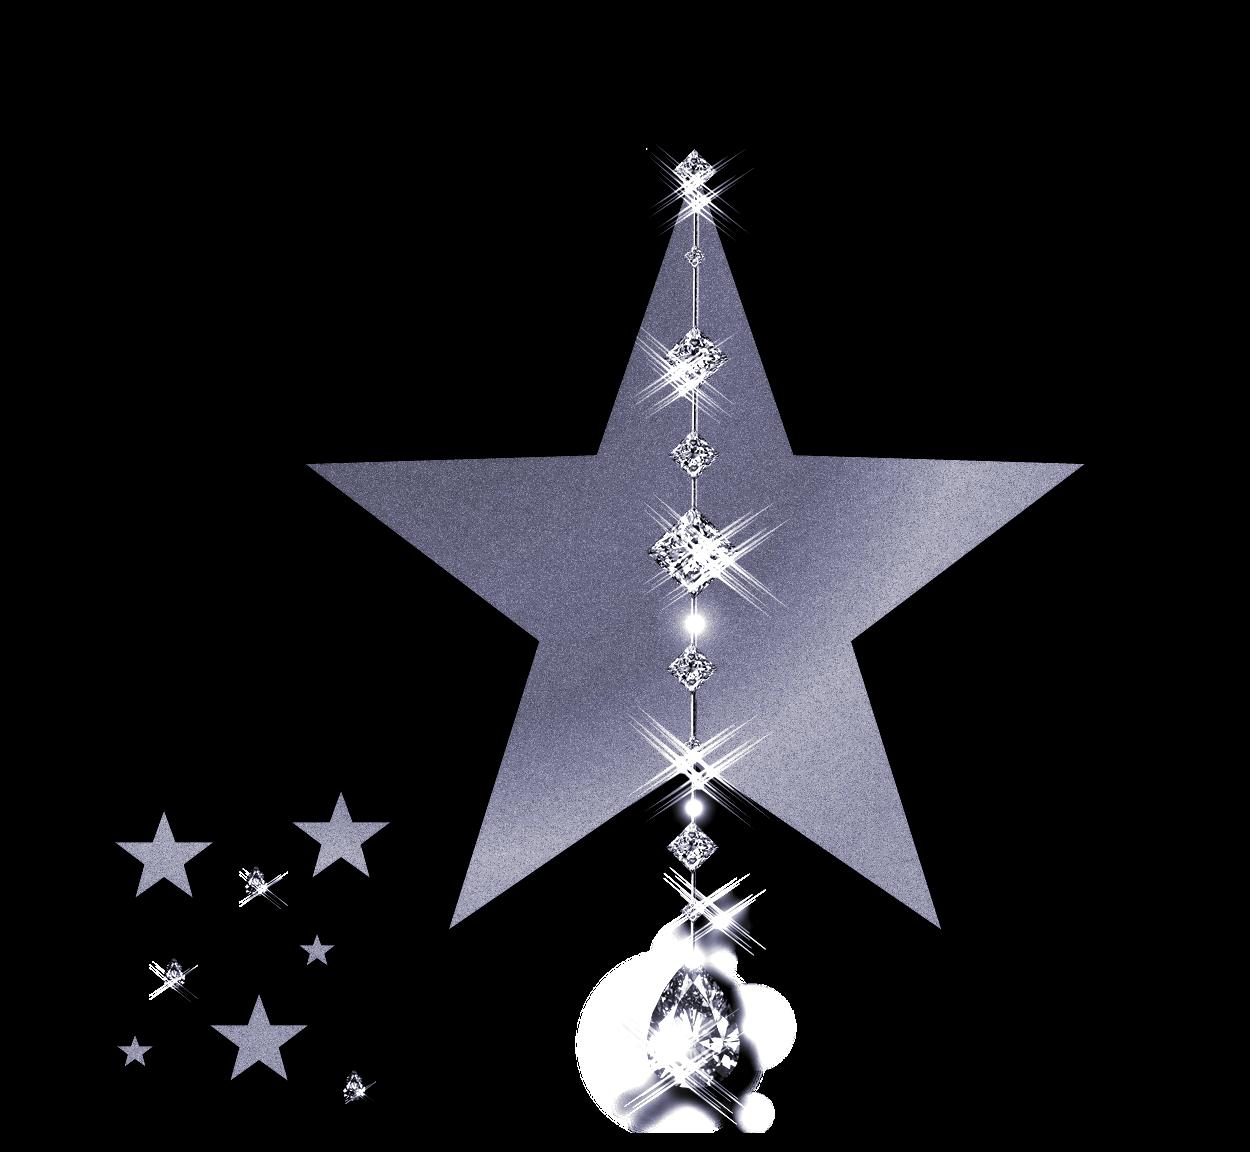 Baseball shooting stars clipart clip art freeuse download Pin by Rosa María Santiago on Stars | Pinterest | Clip art and Star clip art freeuse download